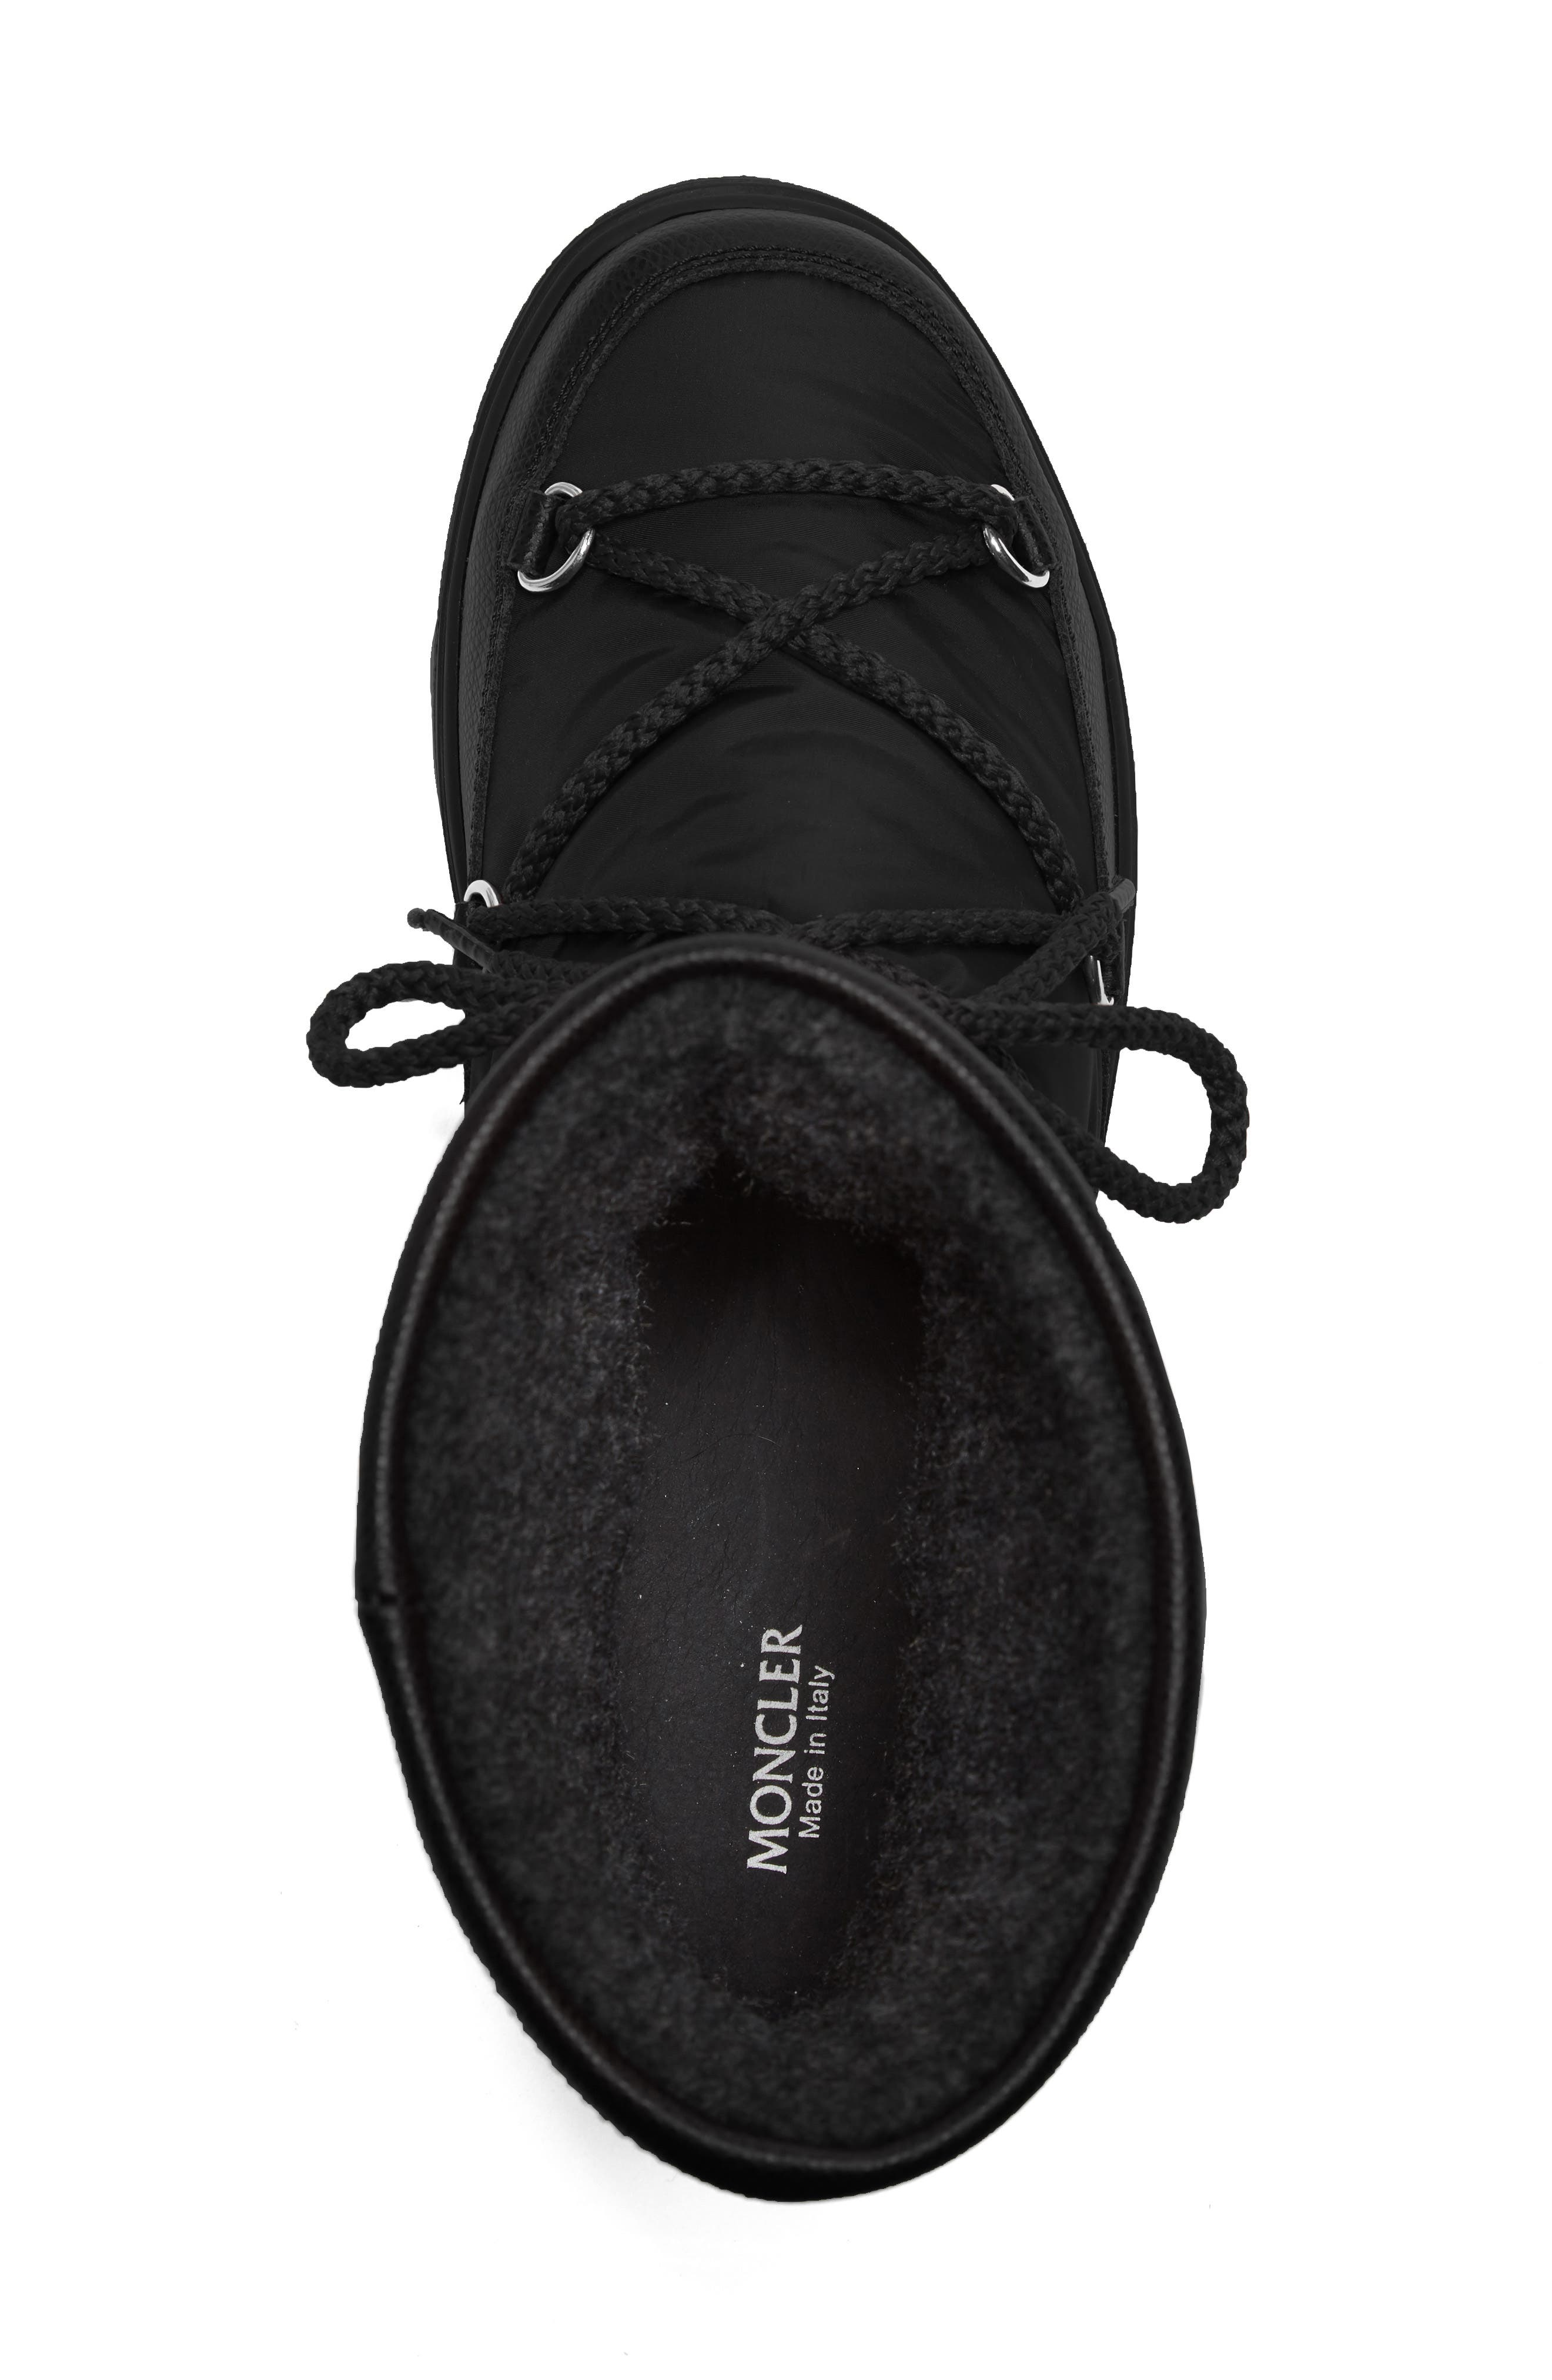 New Fanny Stivale Short Boots,                             Alternate thumbnail 5, color,                             001